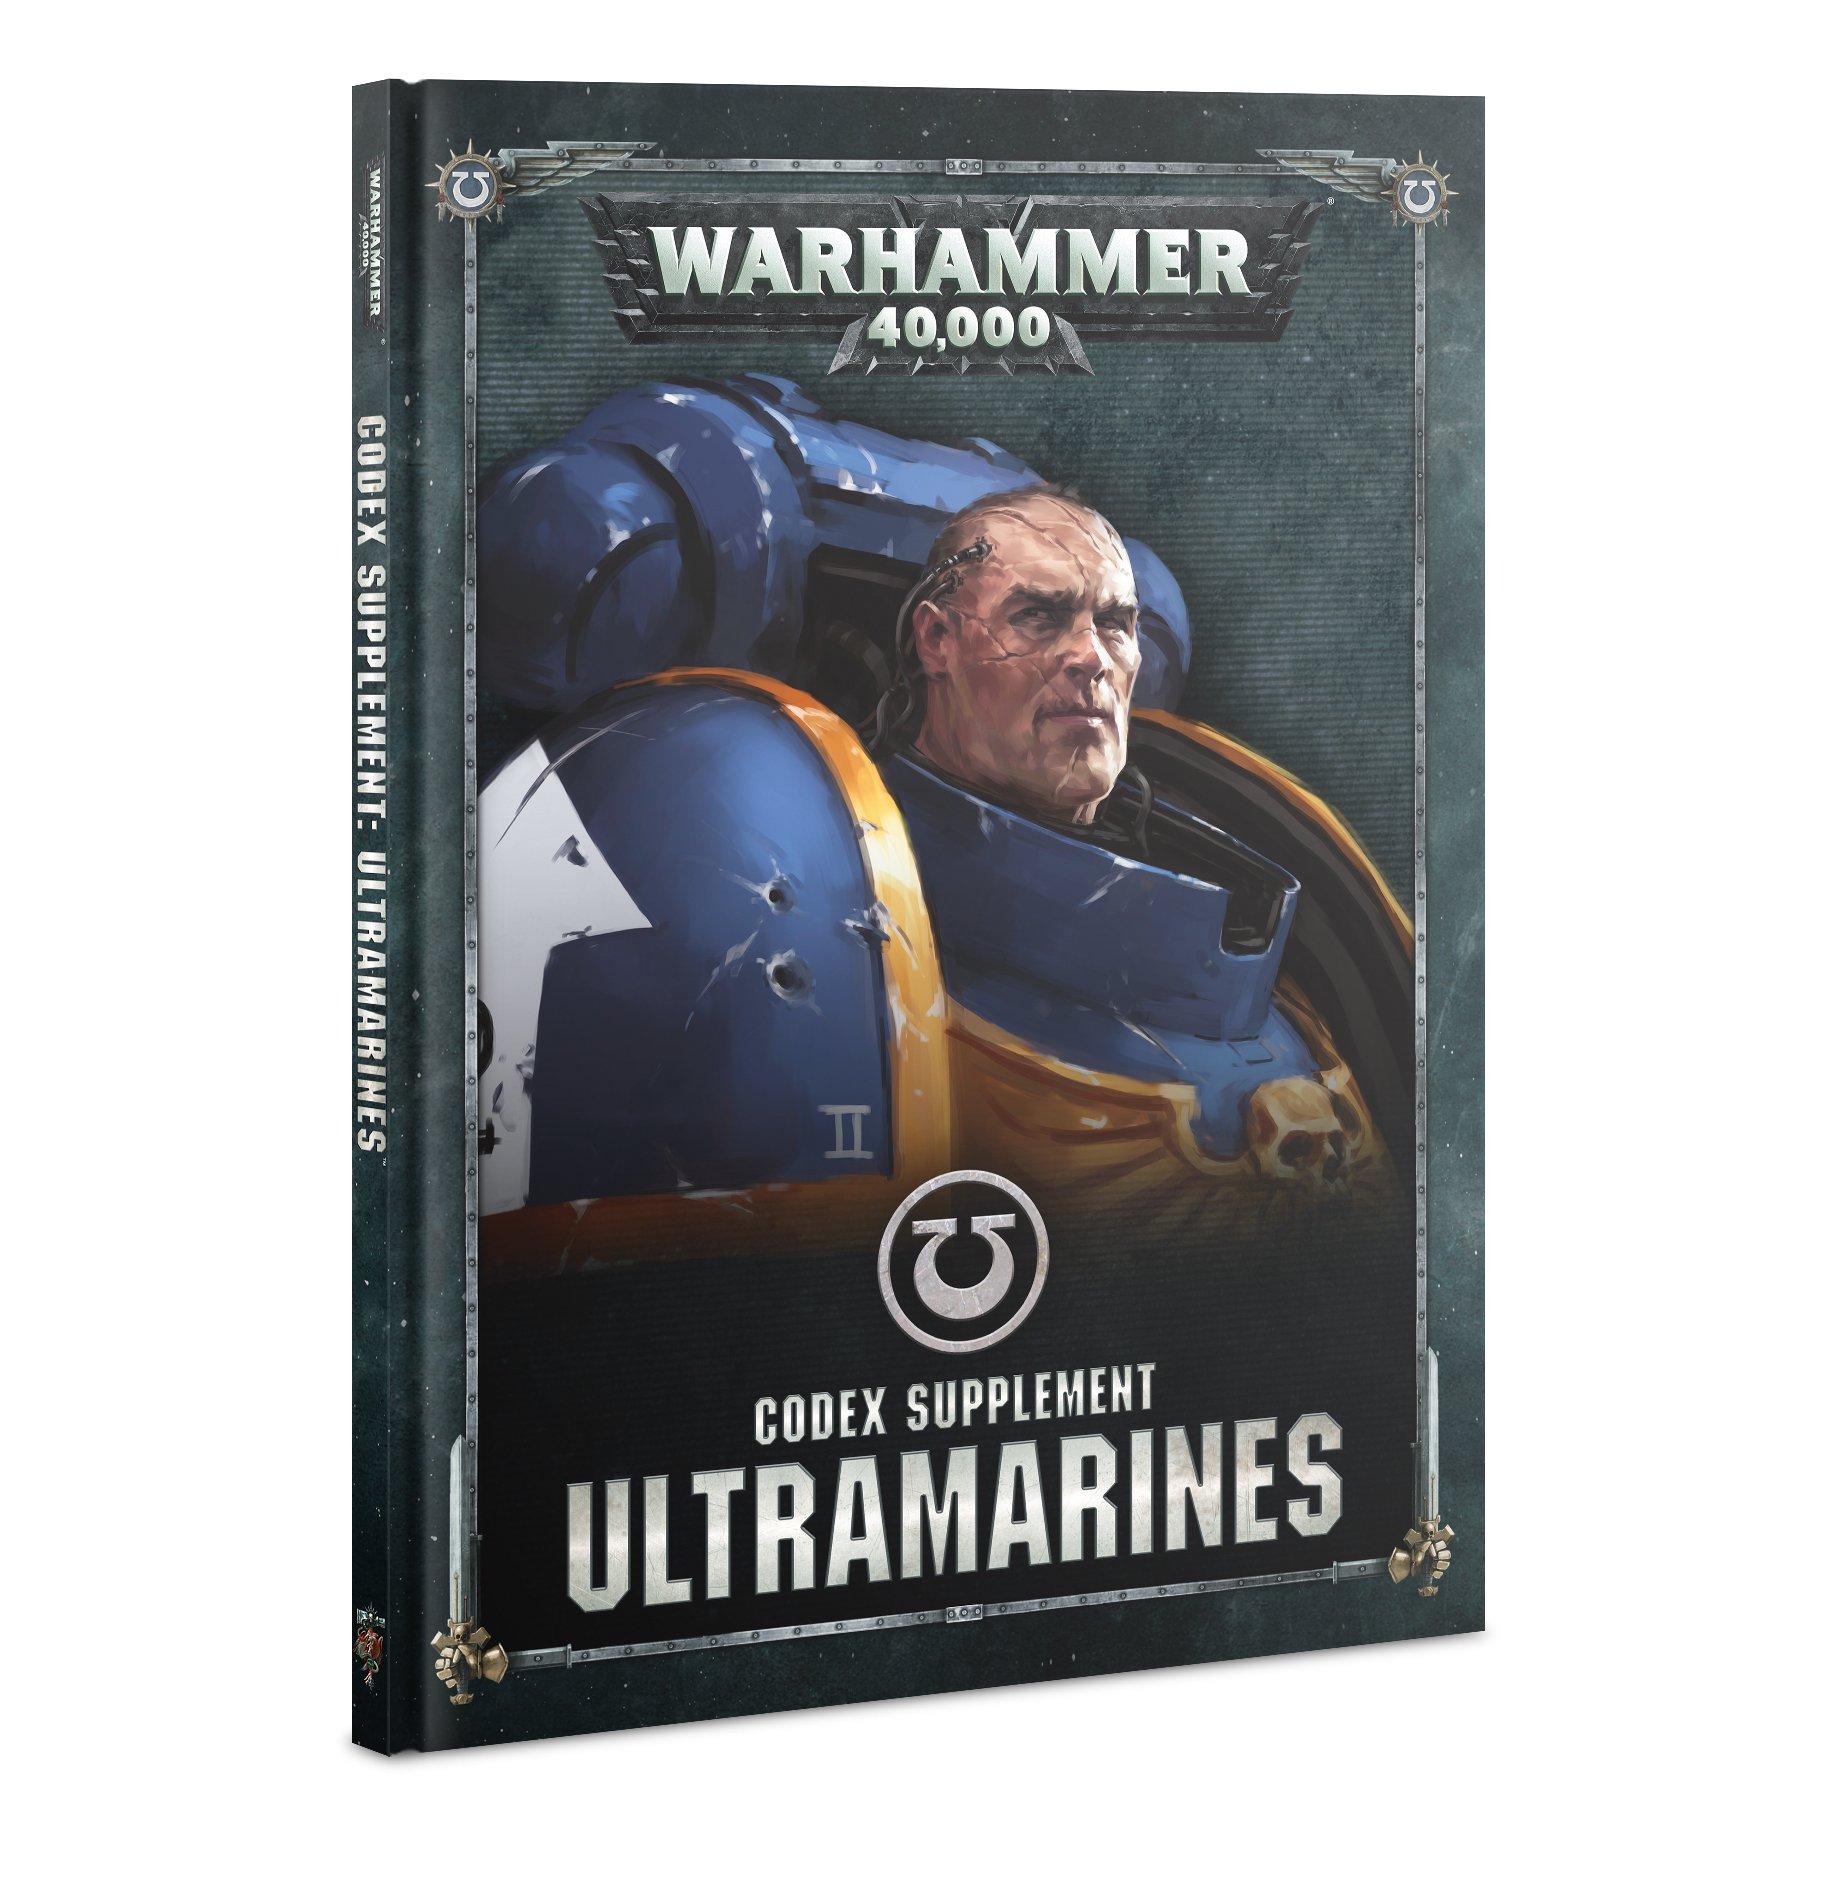 Ultramarines Codex